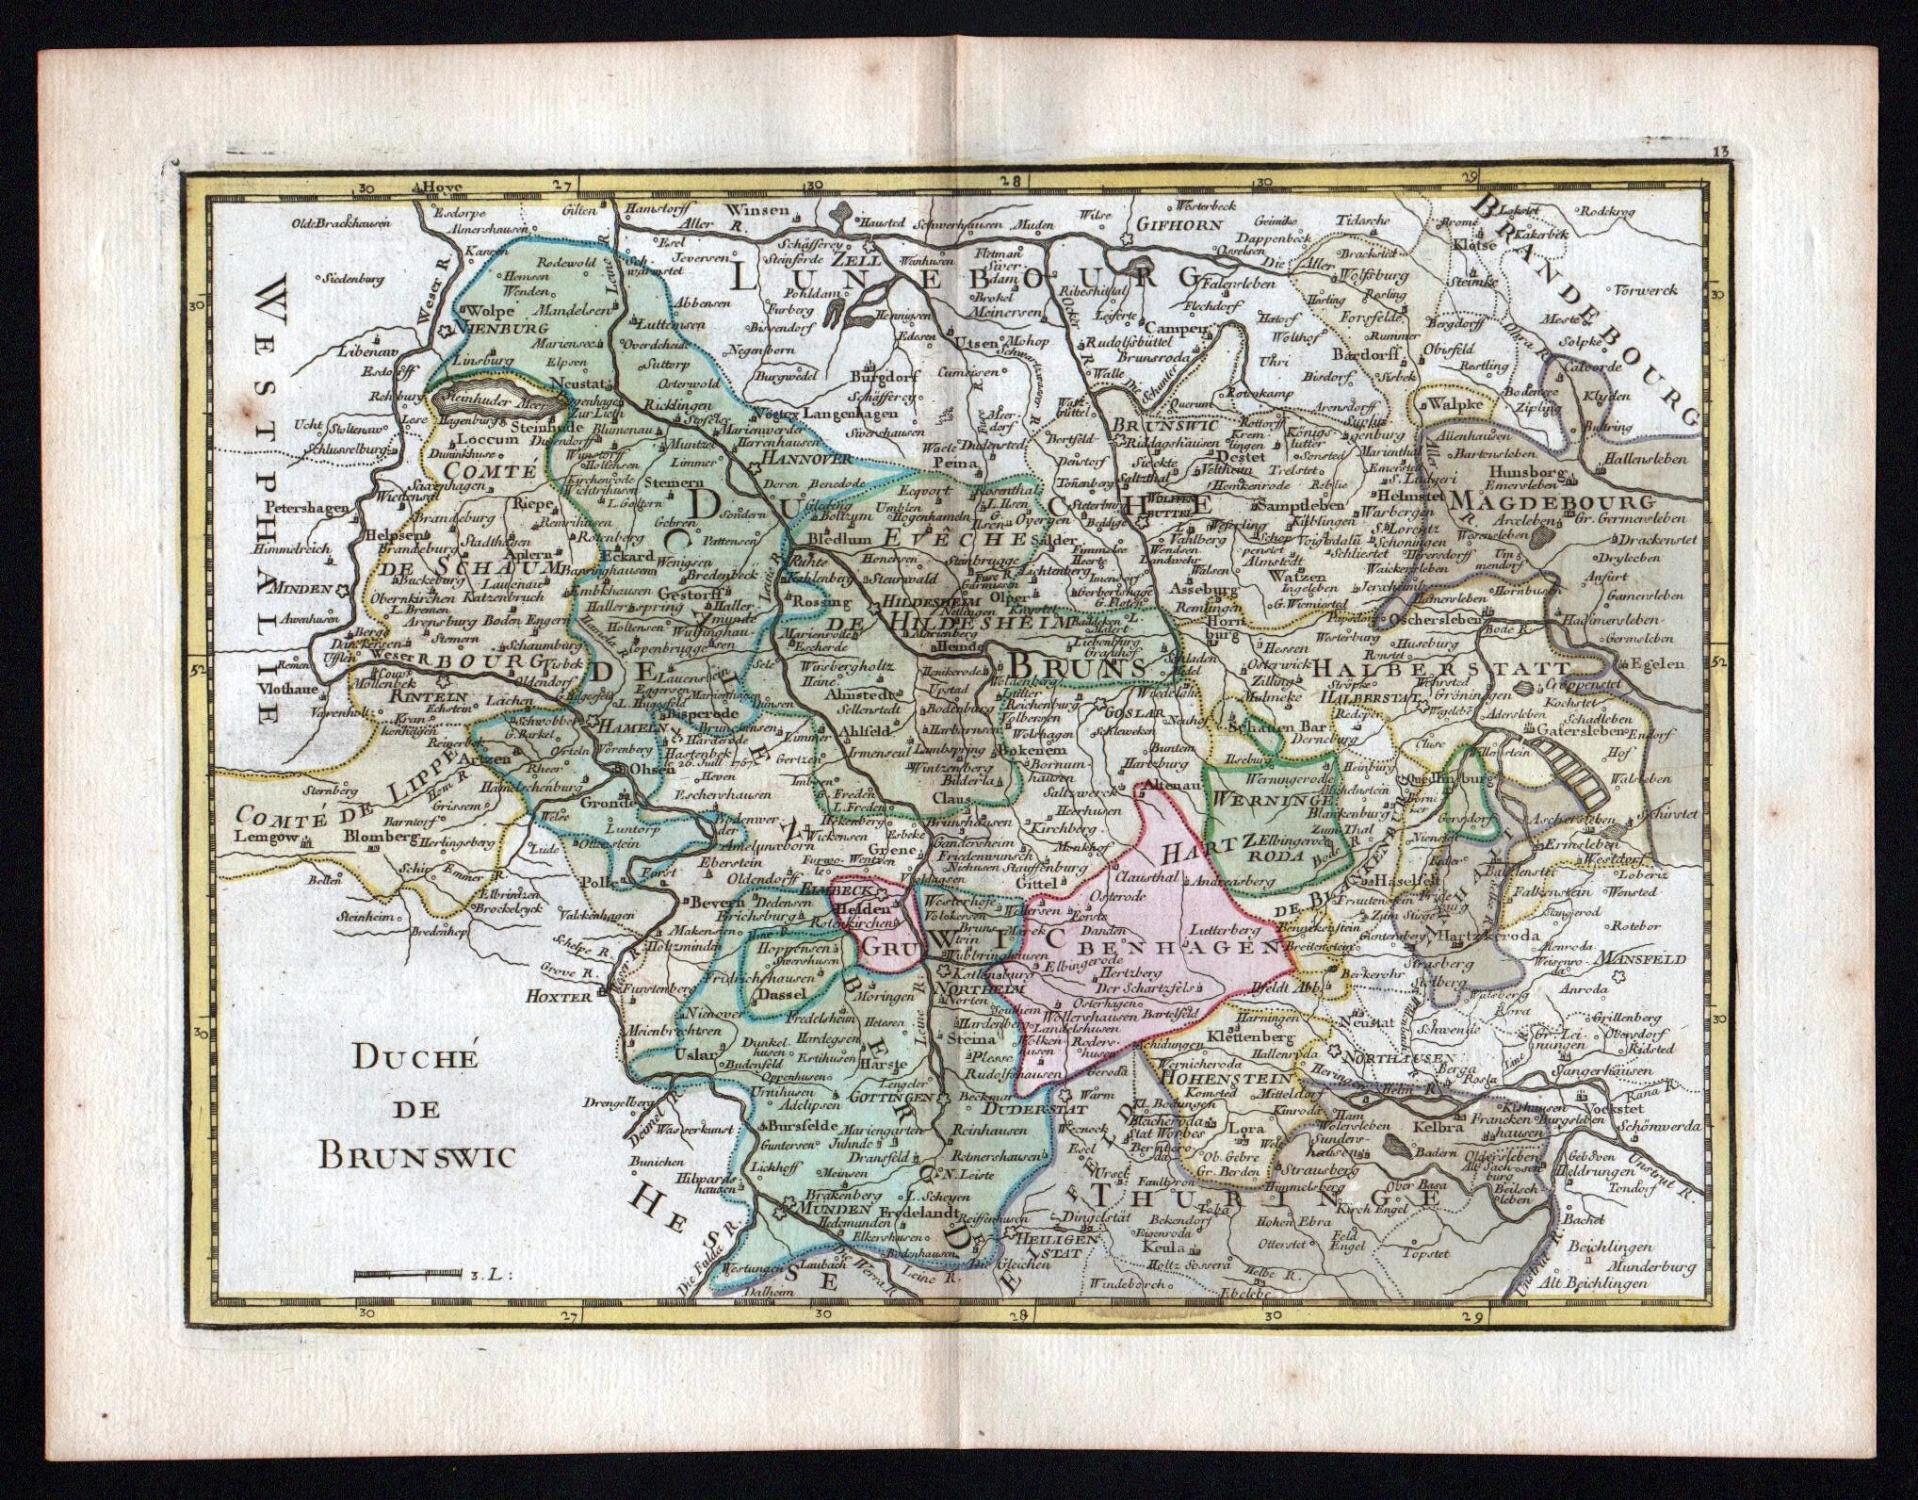 Nordhausen Karte.Duche De Brunswic